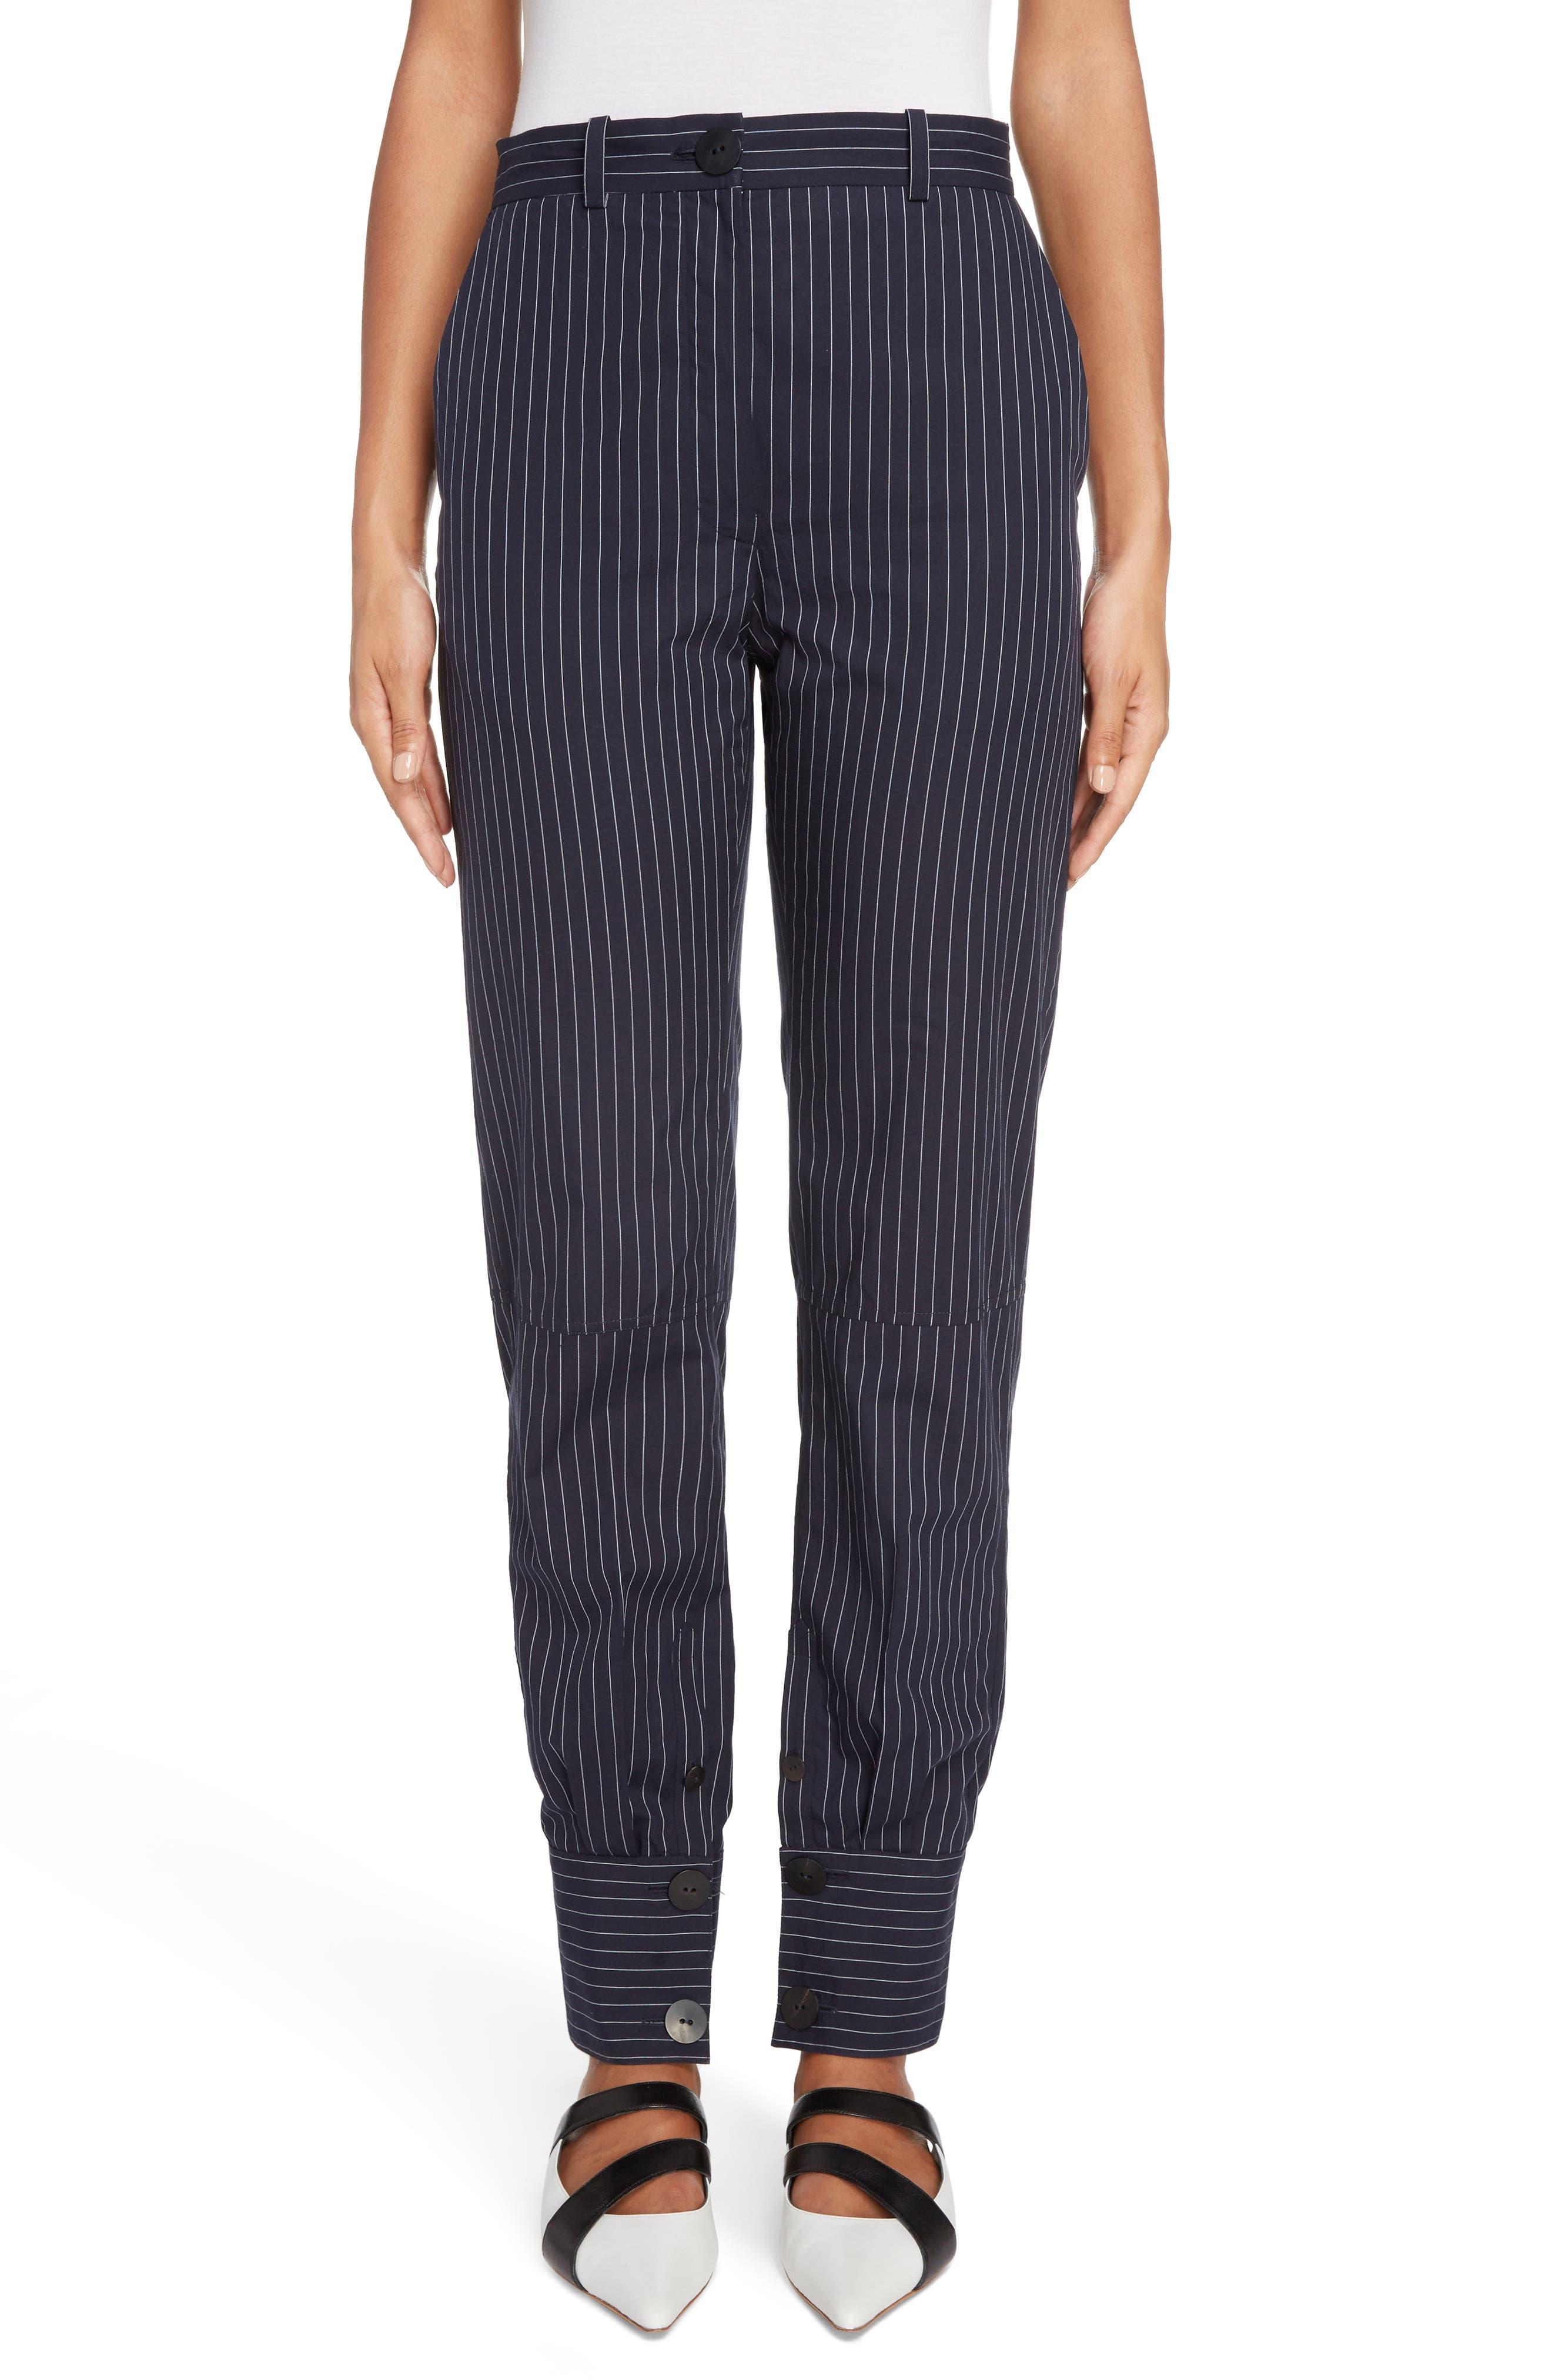 J.W.ANDERSON Cuffed Pinstripe Trousers